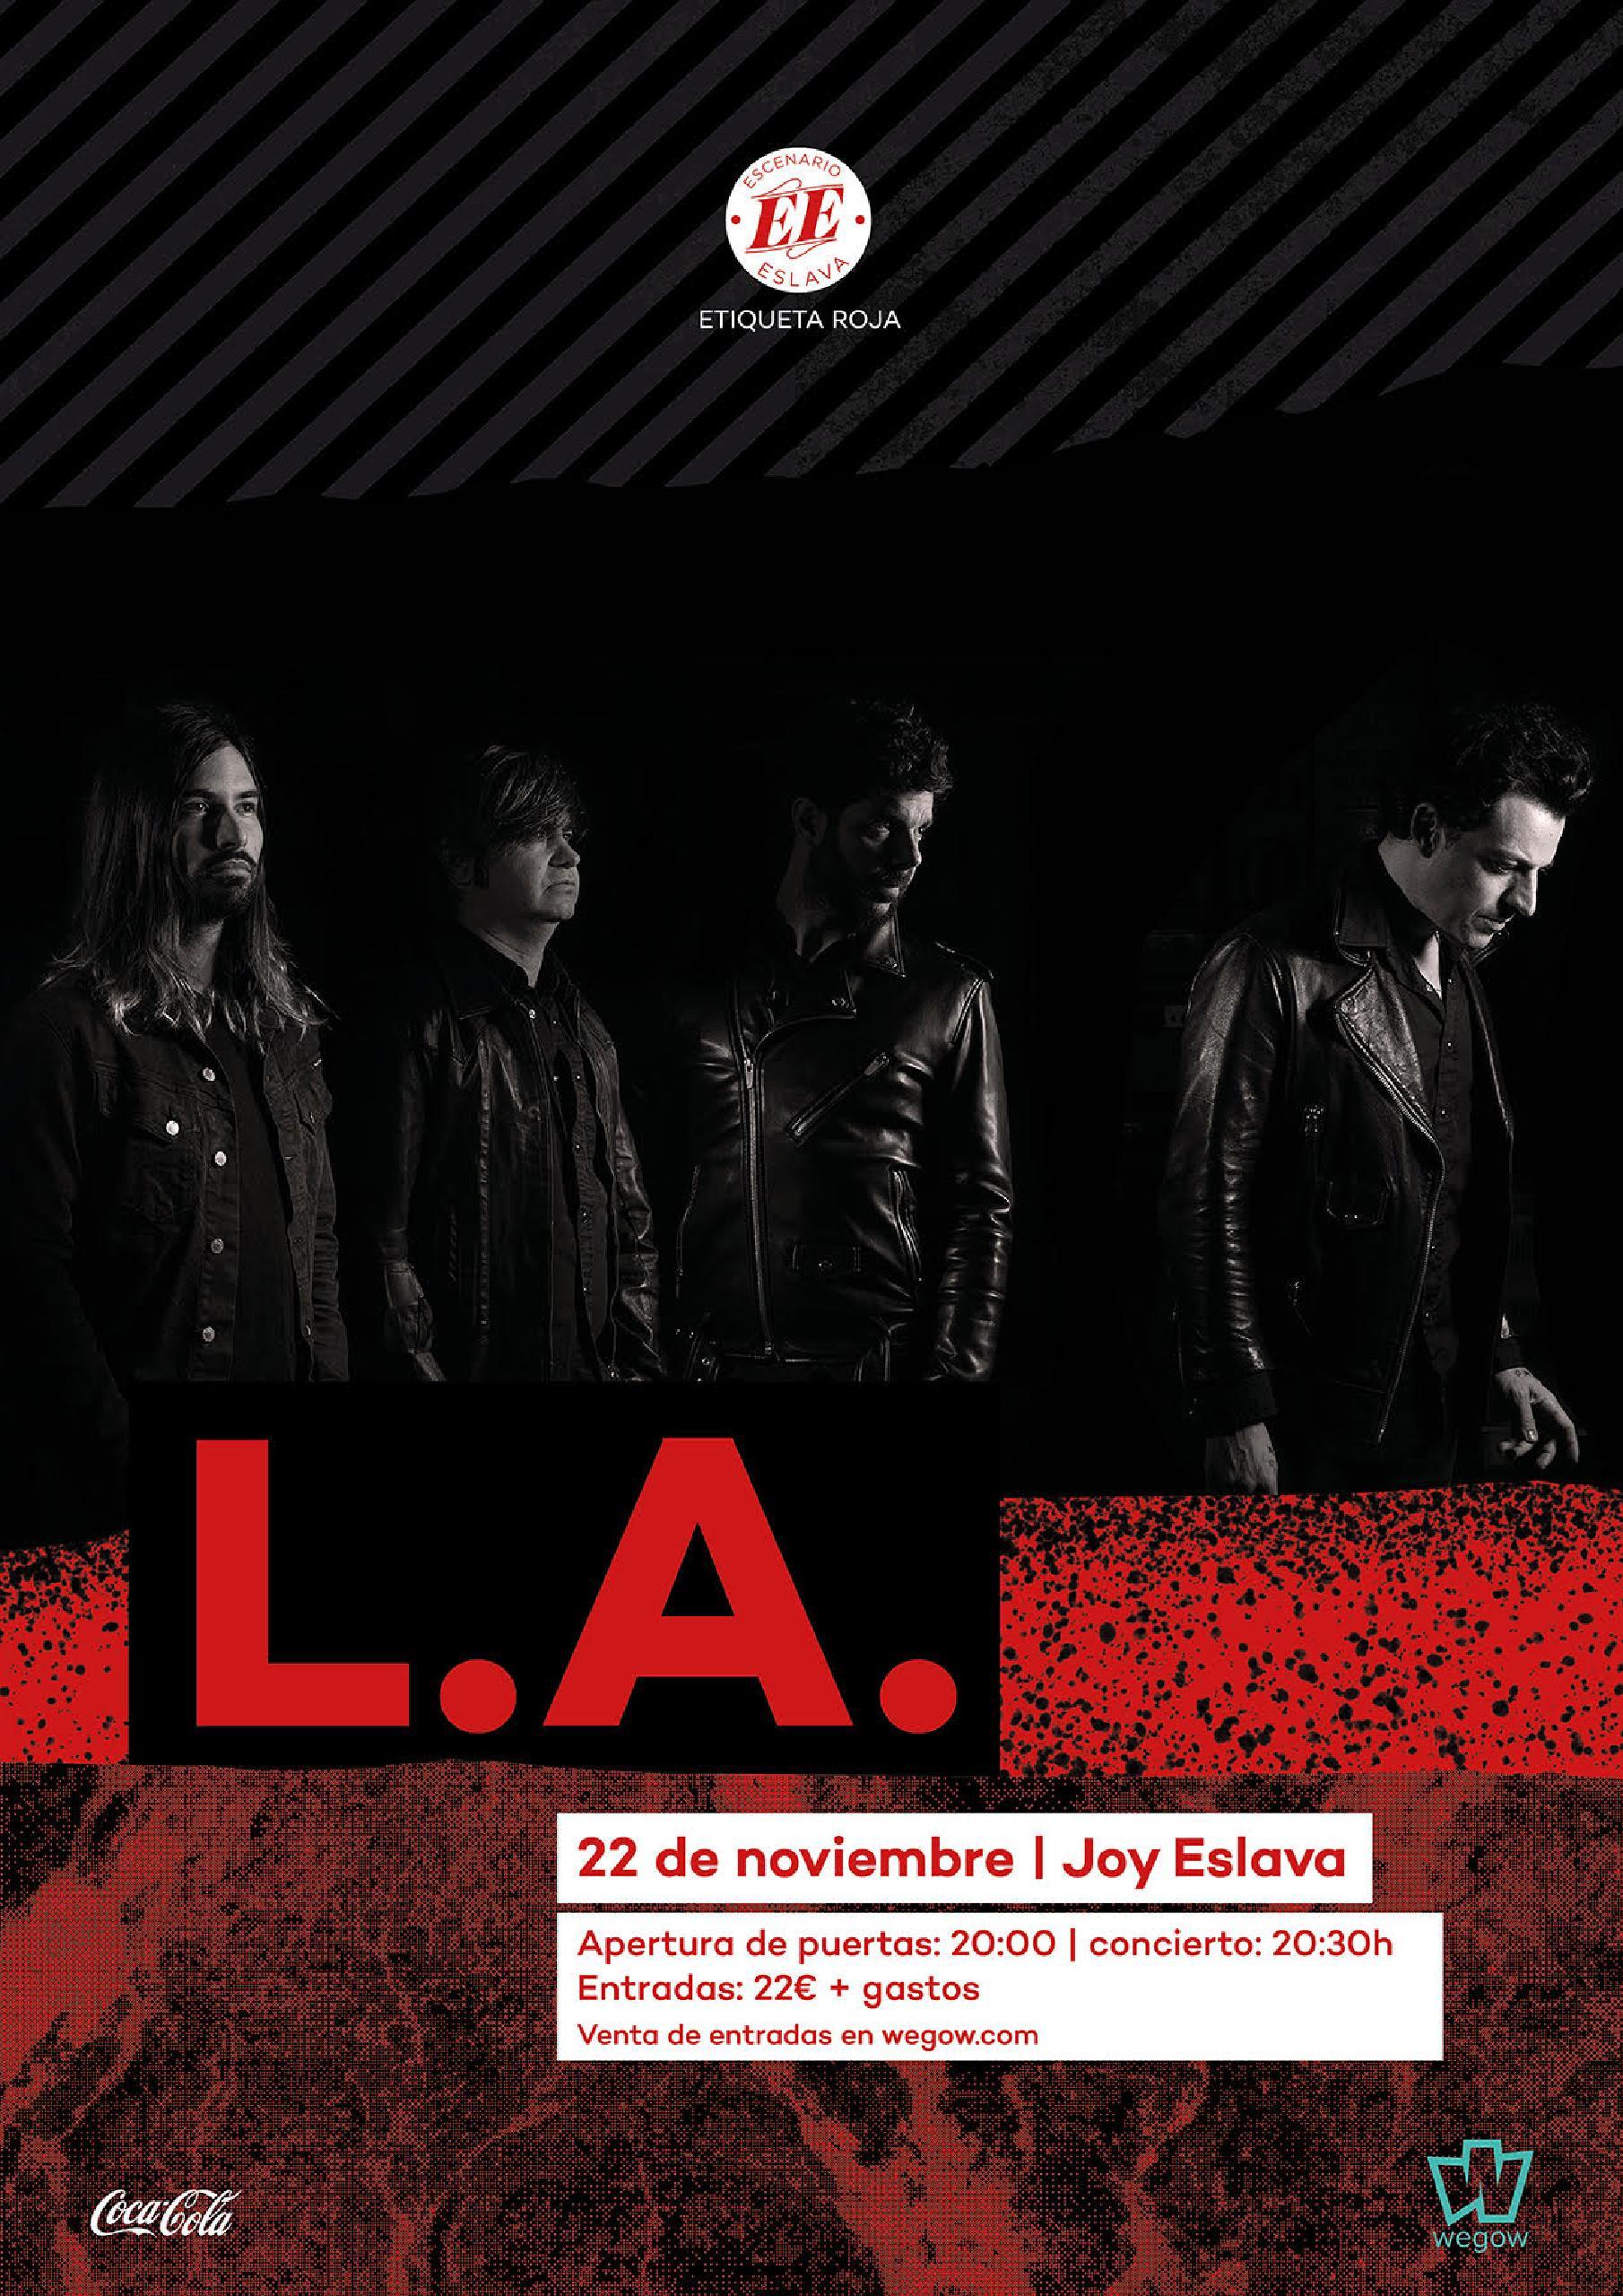 l.a. banda indie rock cartel